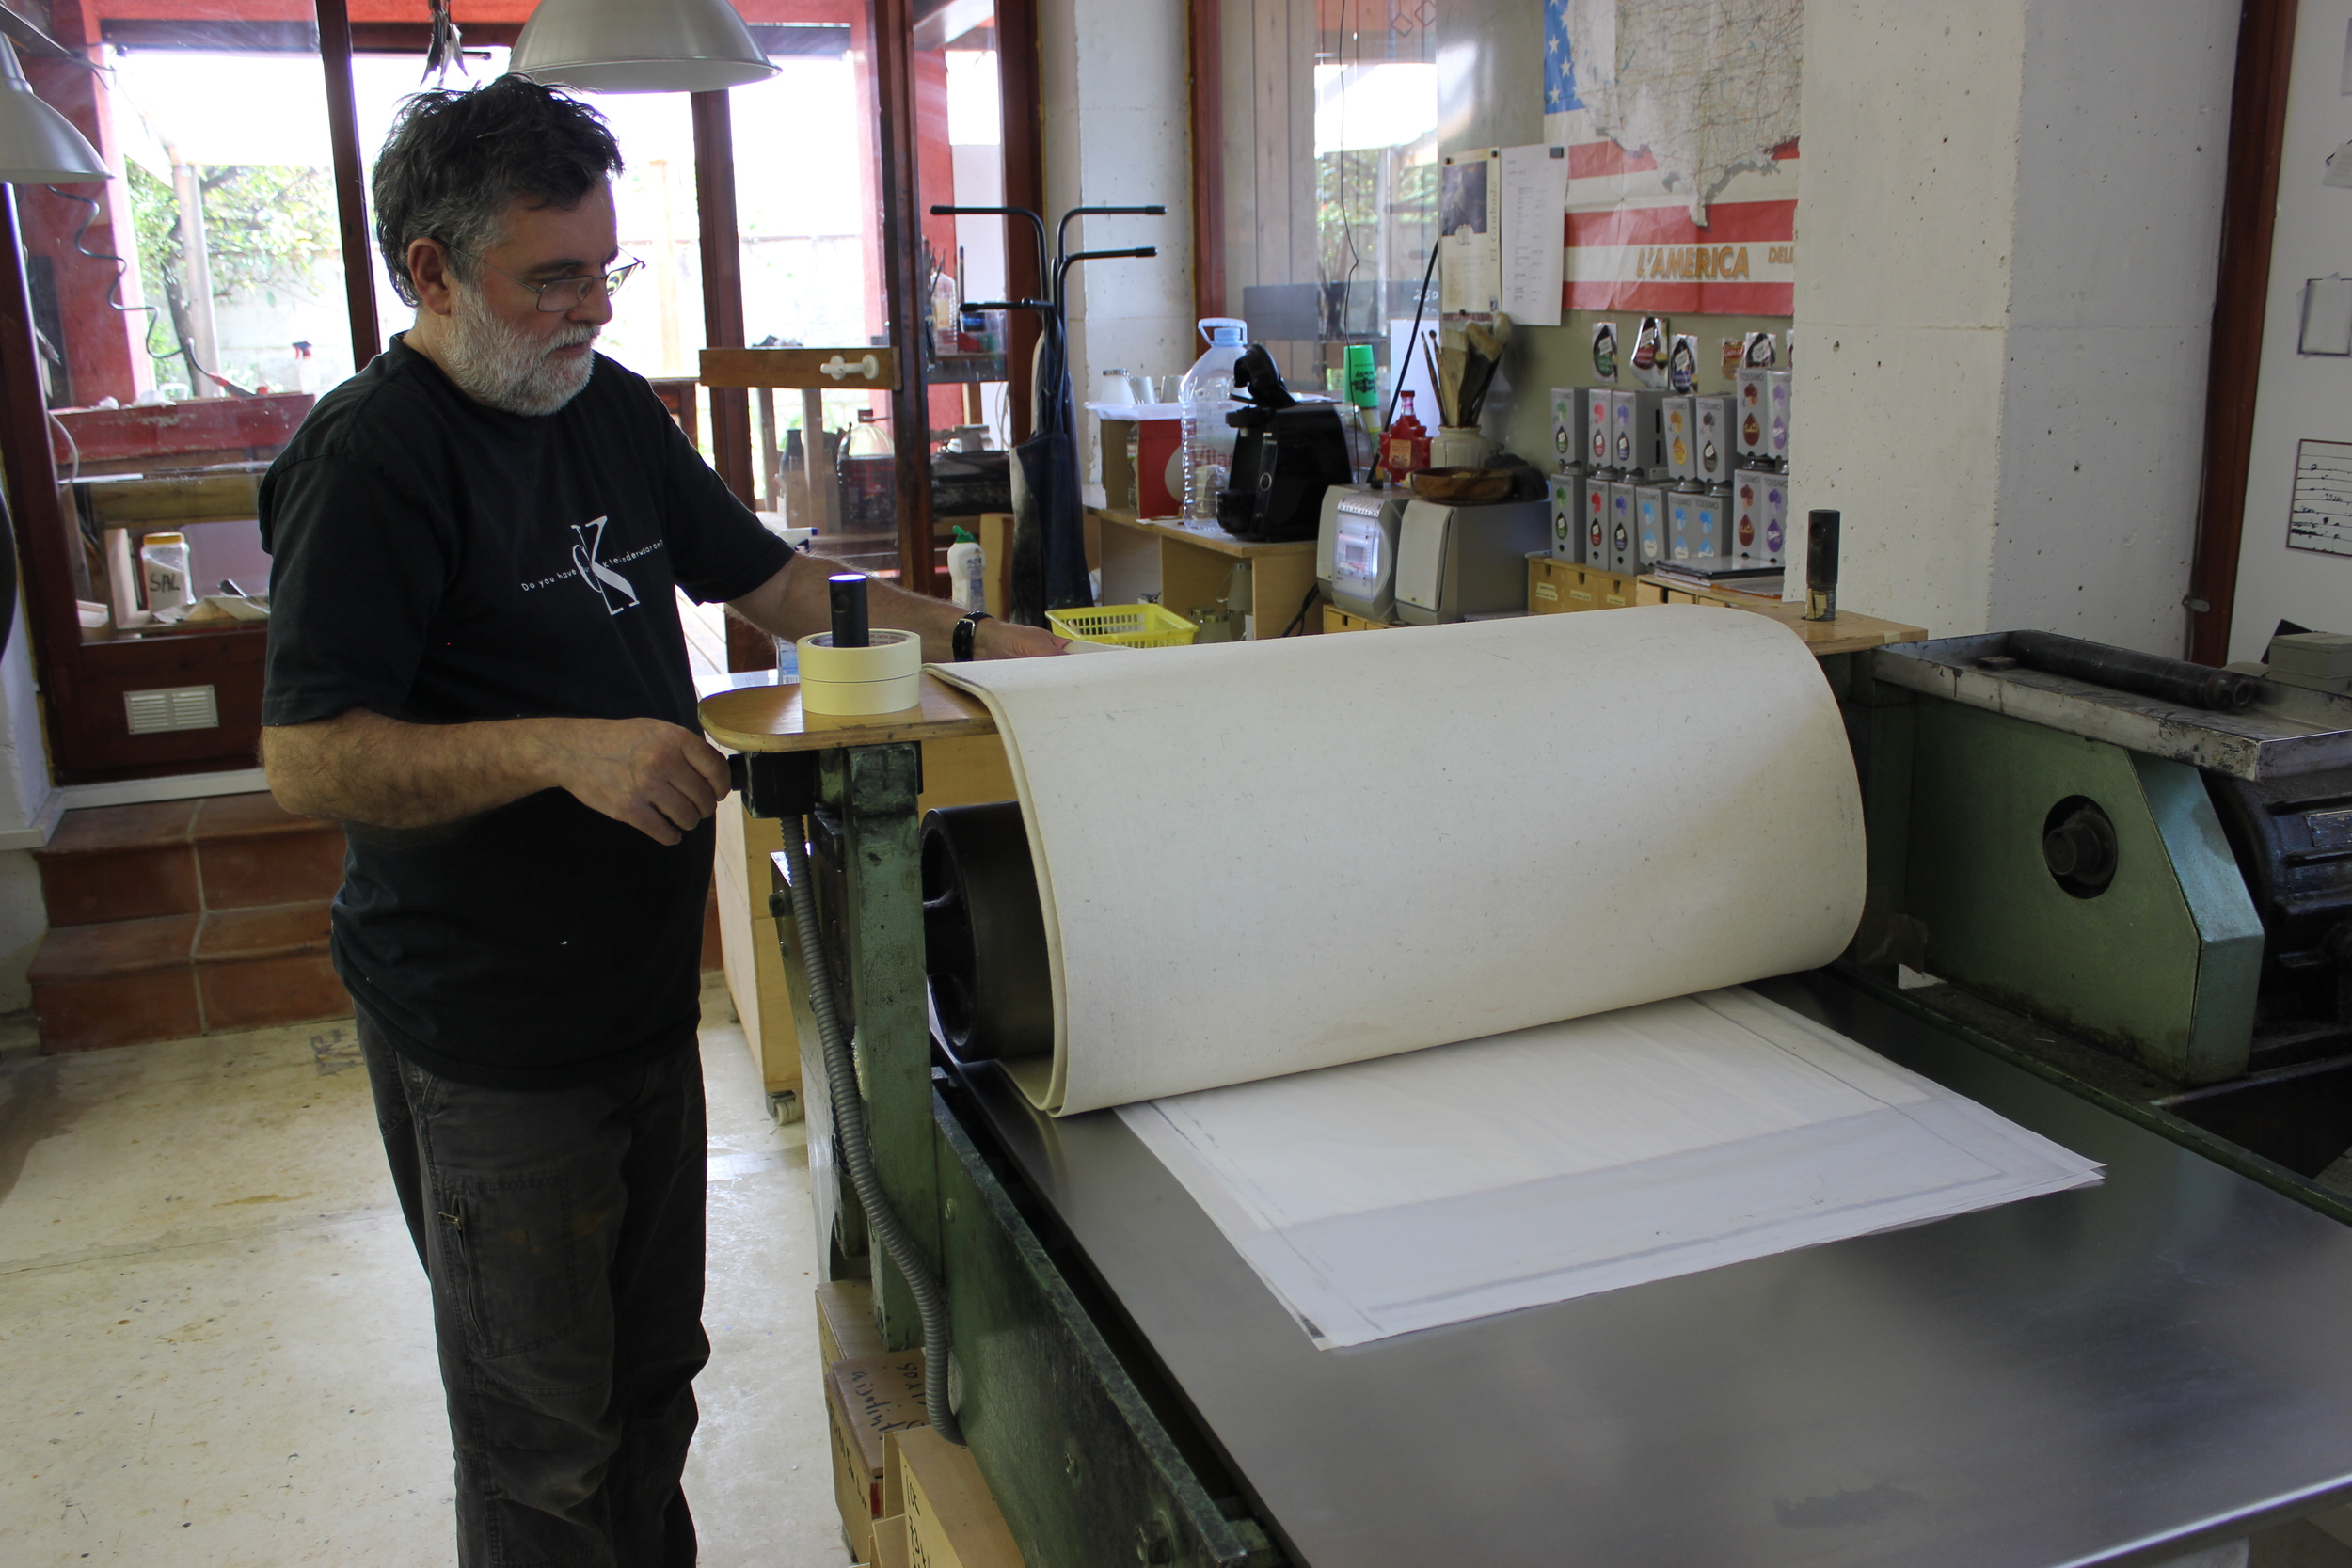 Jordi operating the press